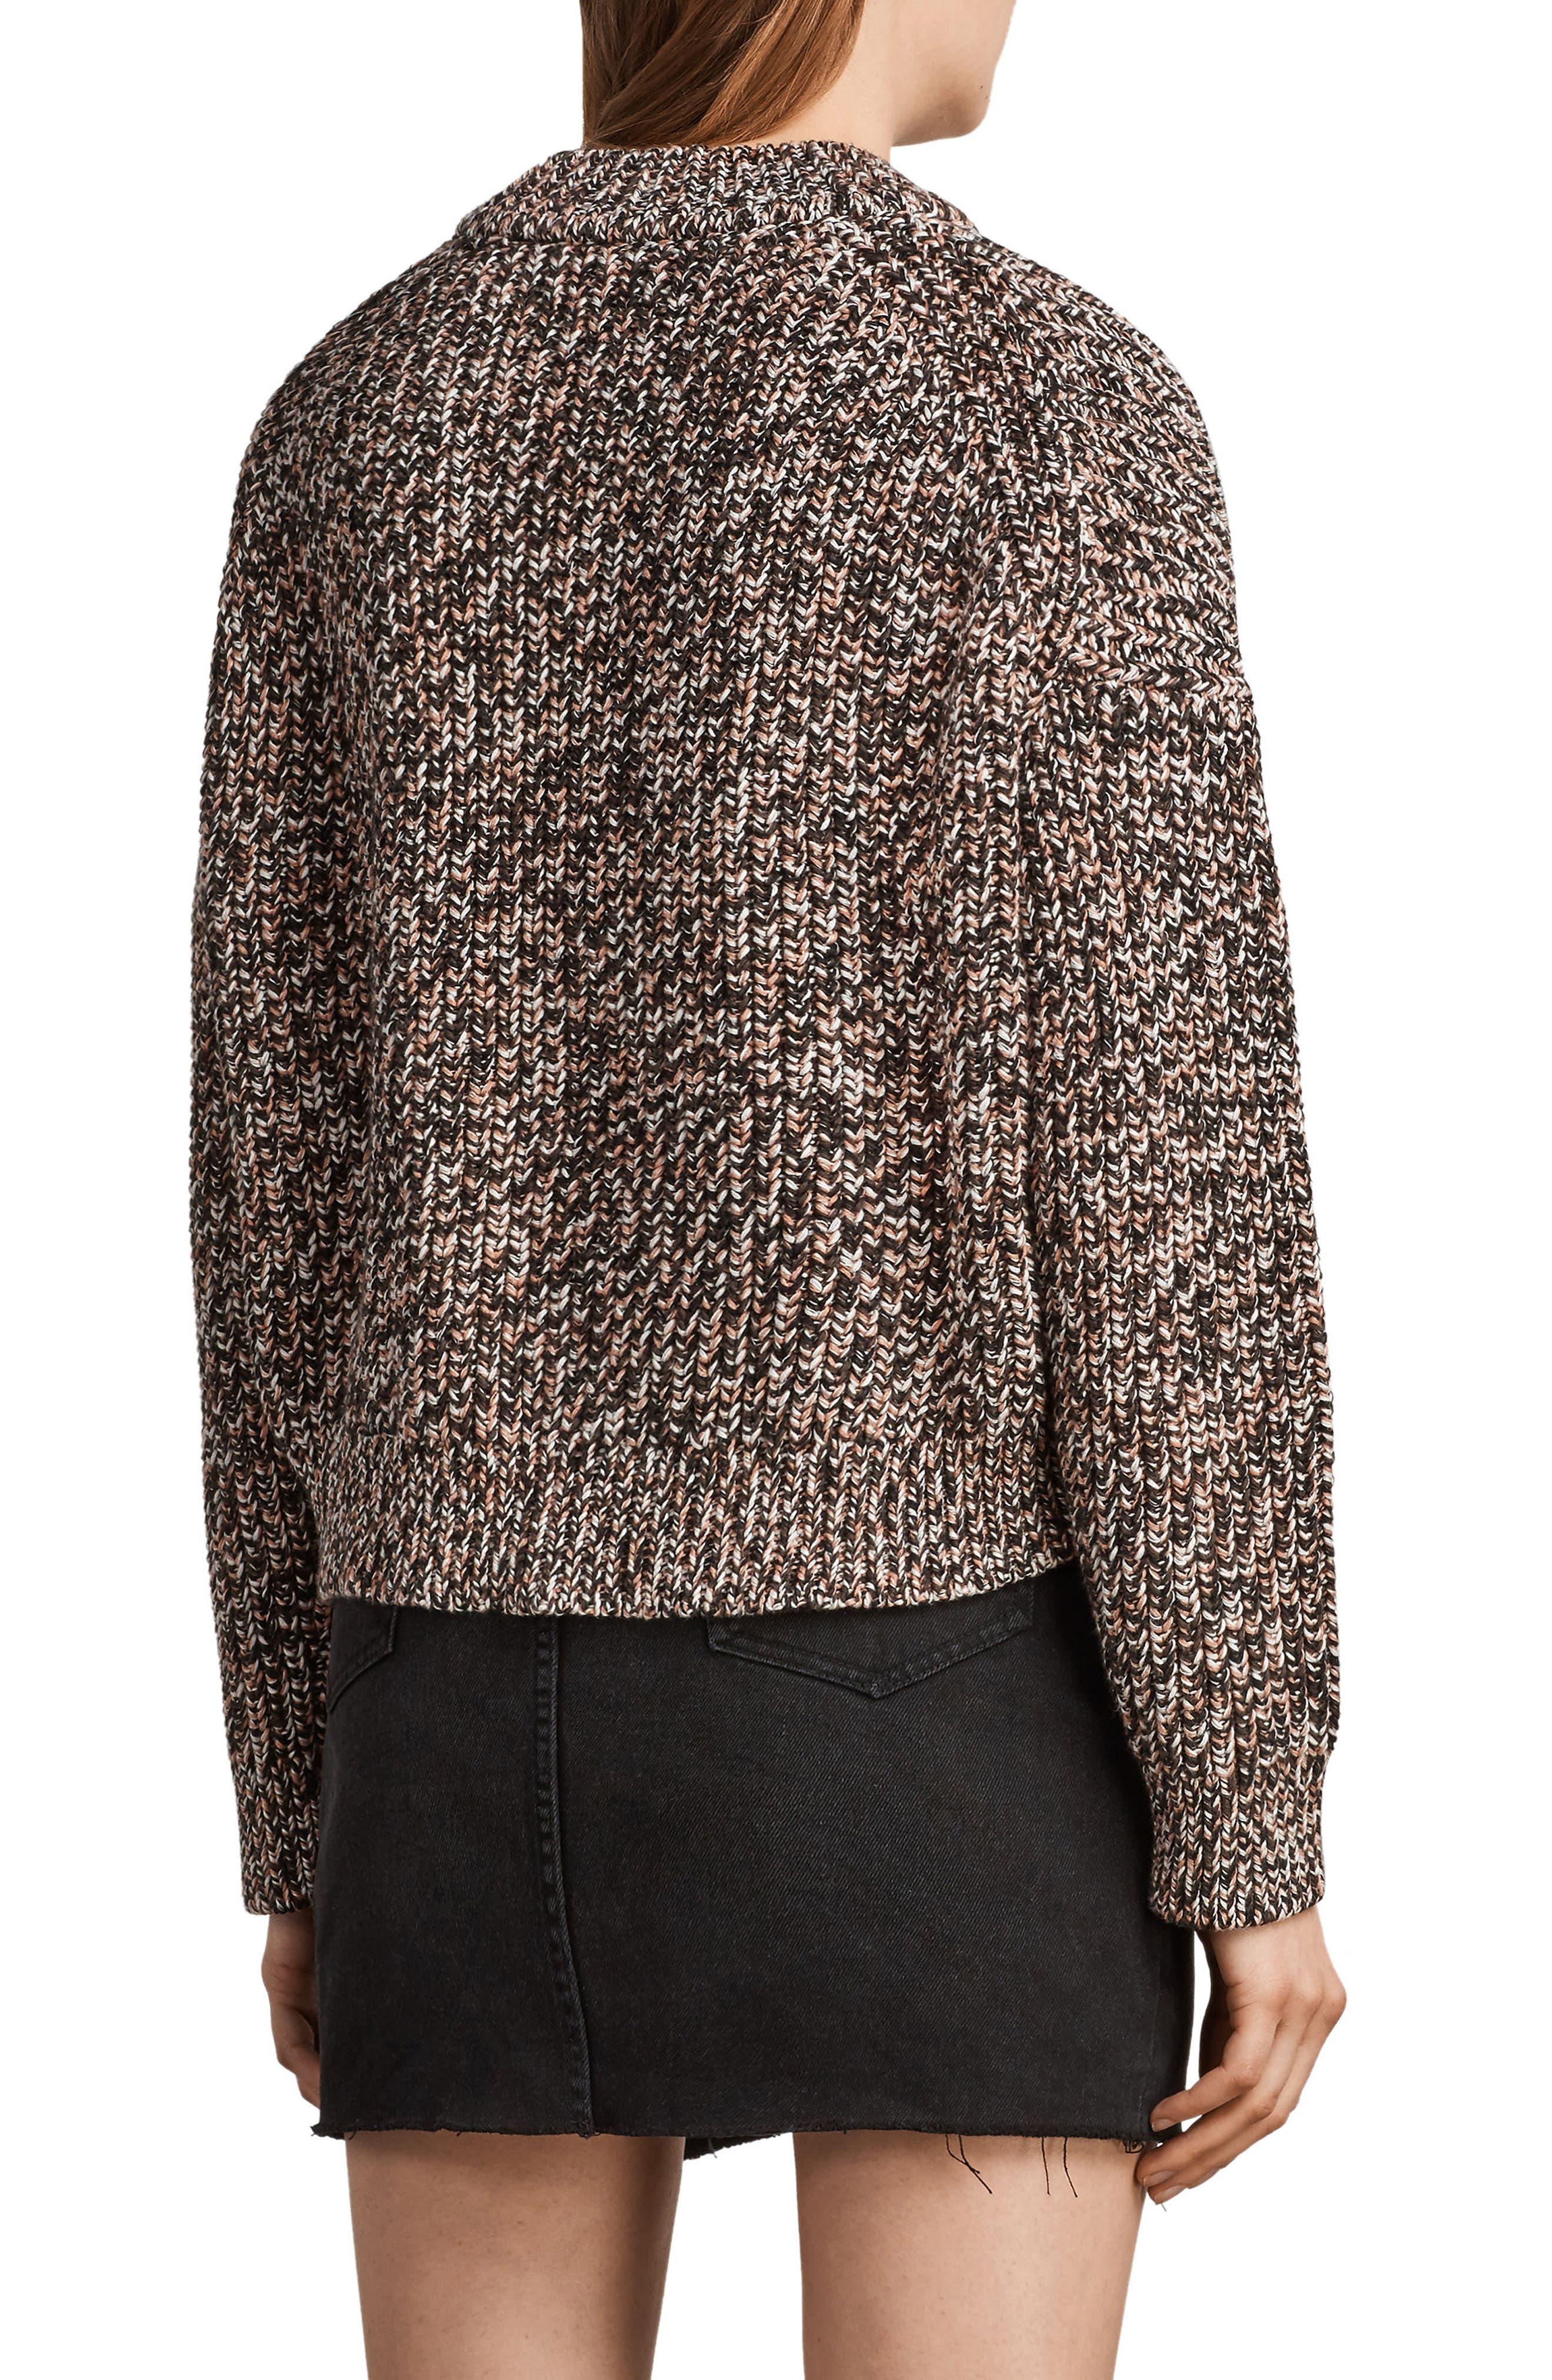 Malu Knit Sweater,                             Alternate thumbnail 2, color,                             690